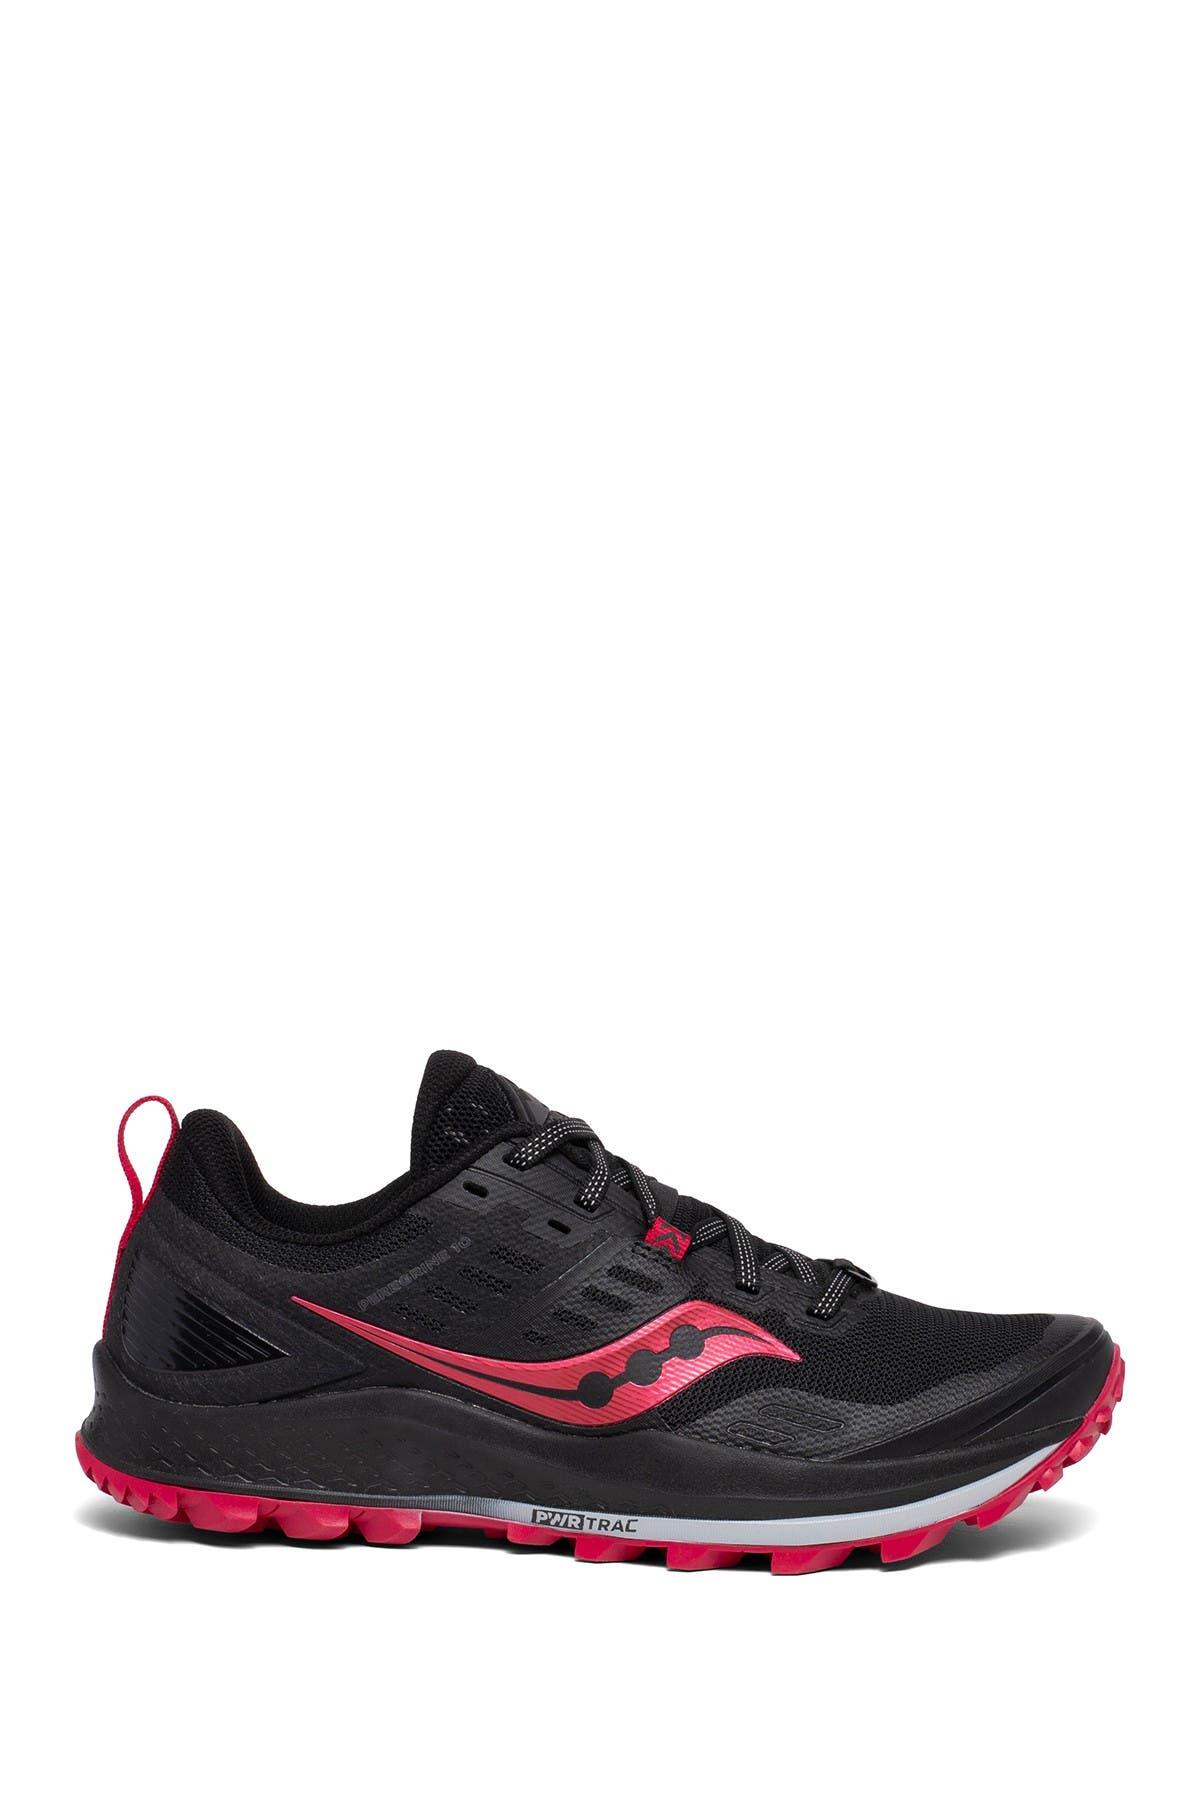 Image of Saucony Peregrine 10 Running Sneaker